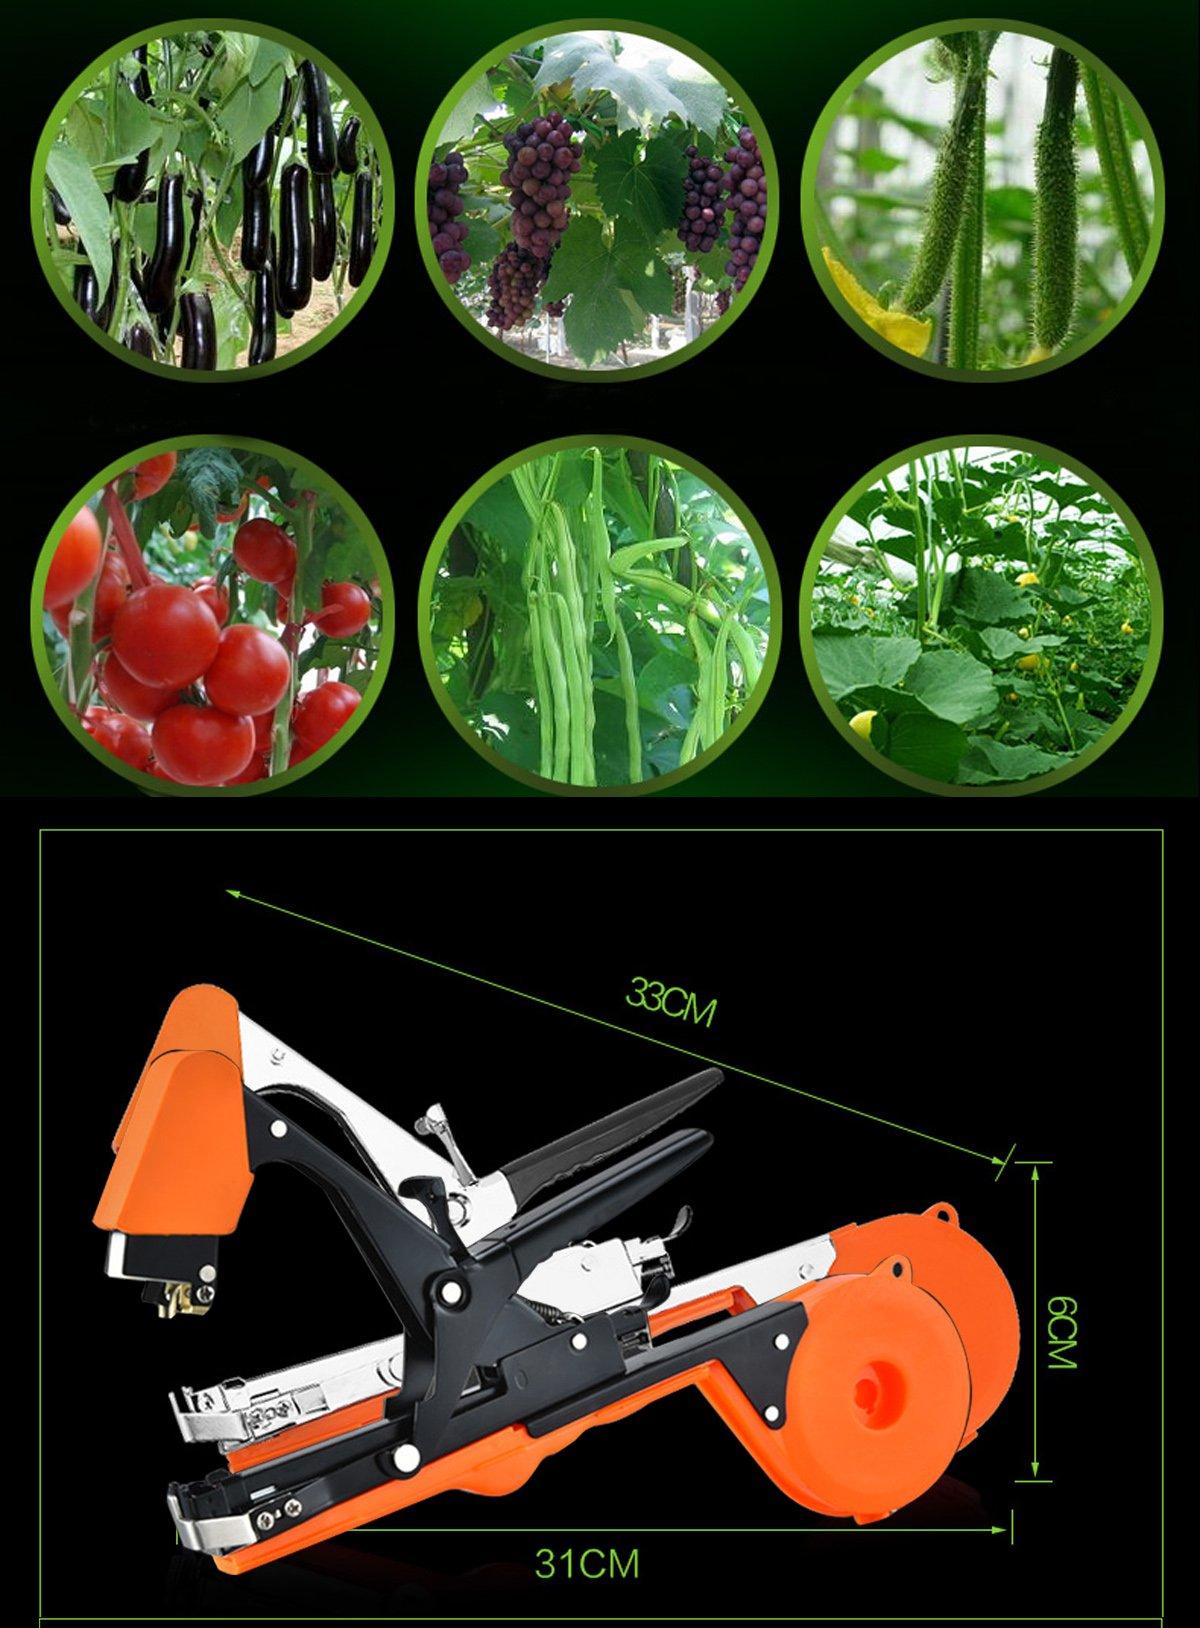 JOYOOO 2018 Newest vineyard tool Garden Vine Tying Tape Plant Tying Machine Agriculture Tapener Hand Tying Machine fix the vine plant such as tomato, cucumber, ect 10 rolls tape+1 staples +Tying Tool by JOYOOO (Image #1)